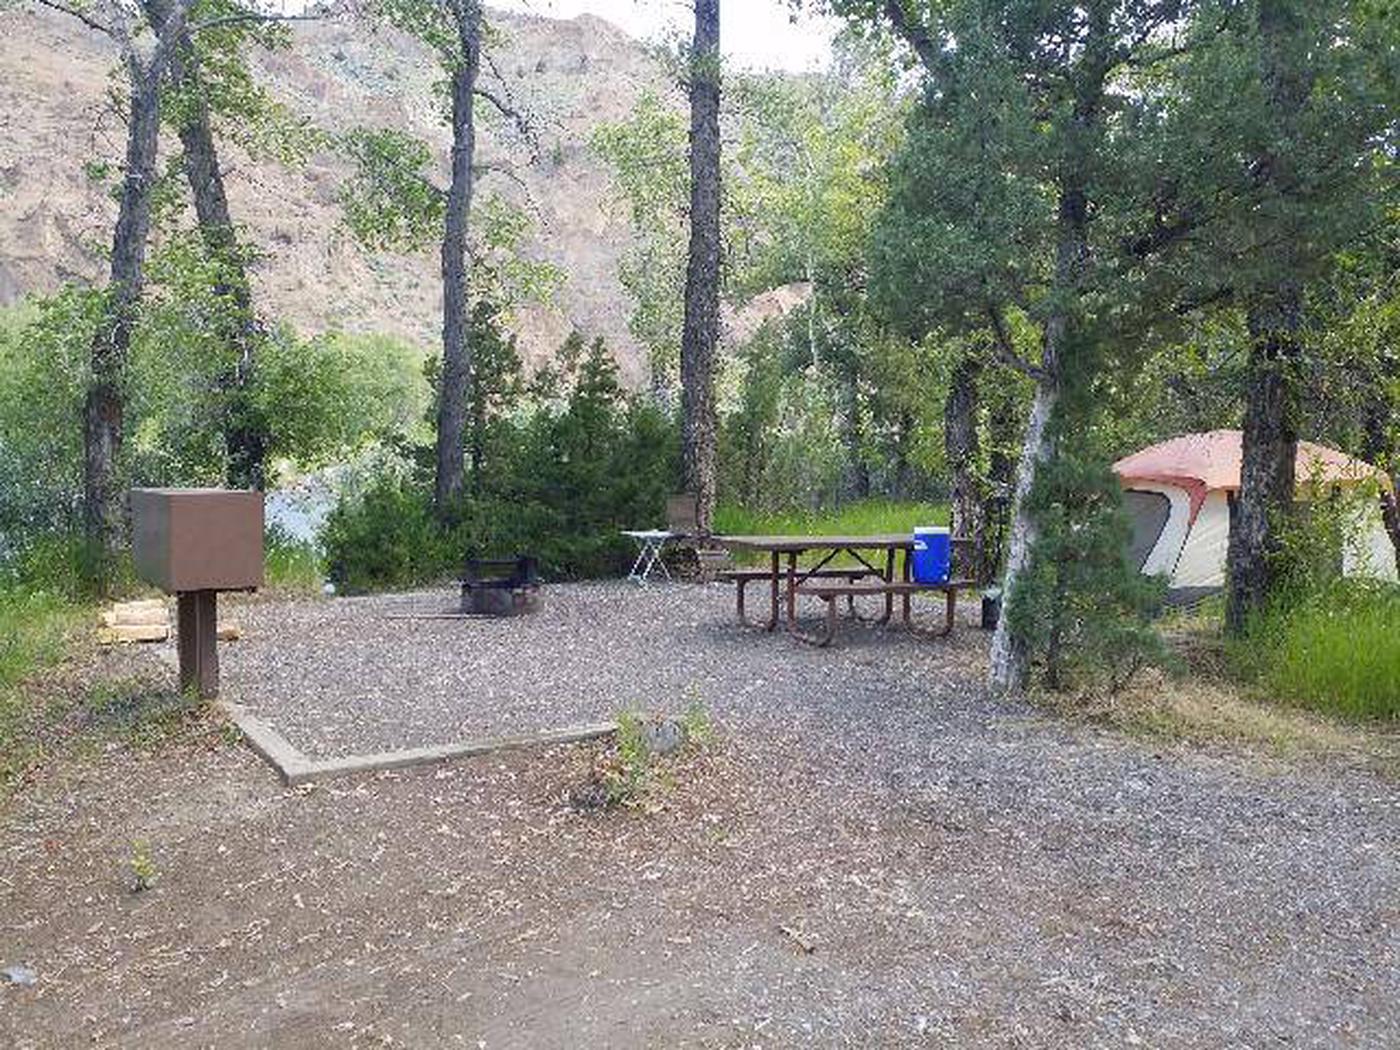 Wapiti Campsite 28 - Picnic Area